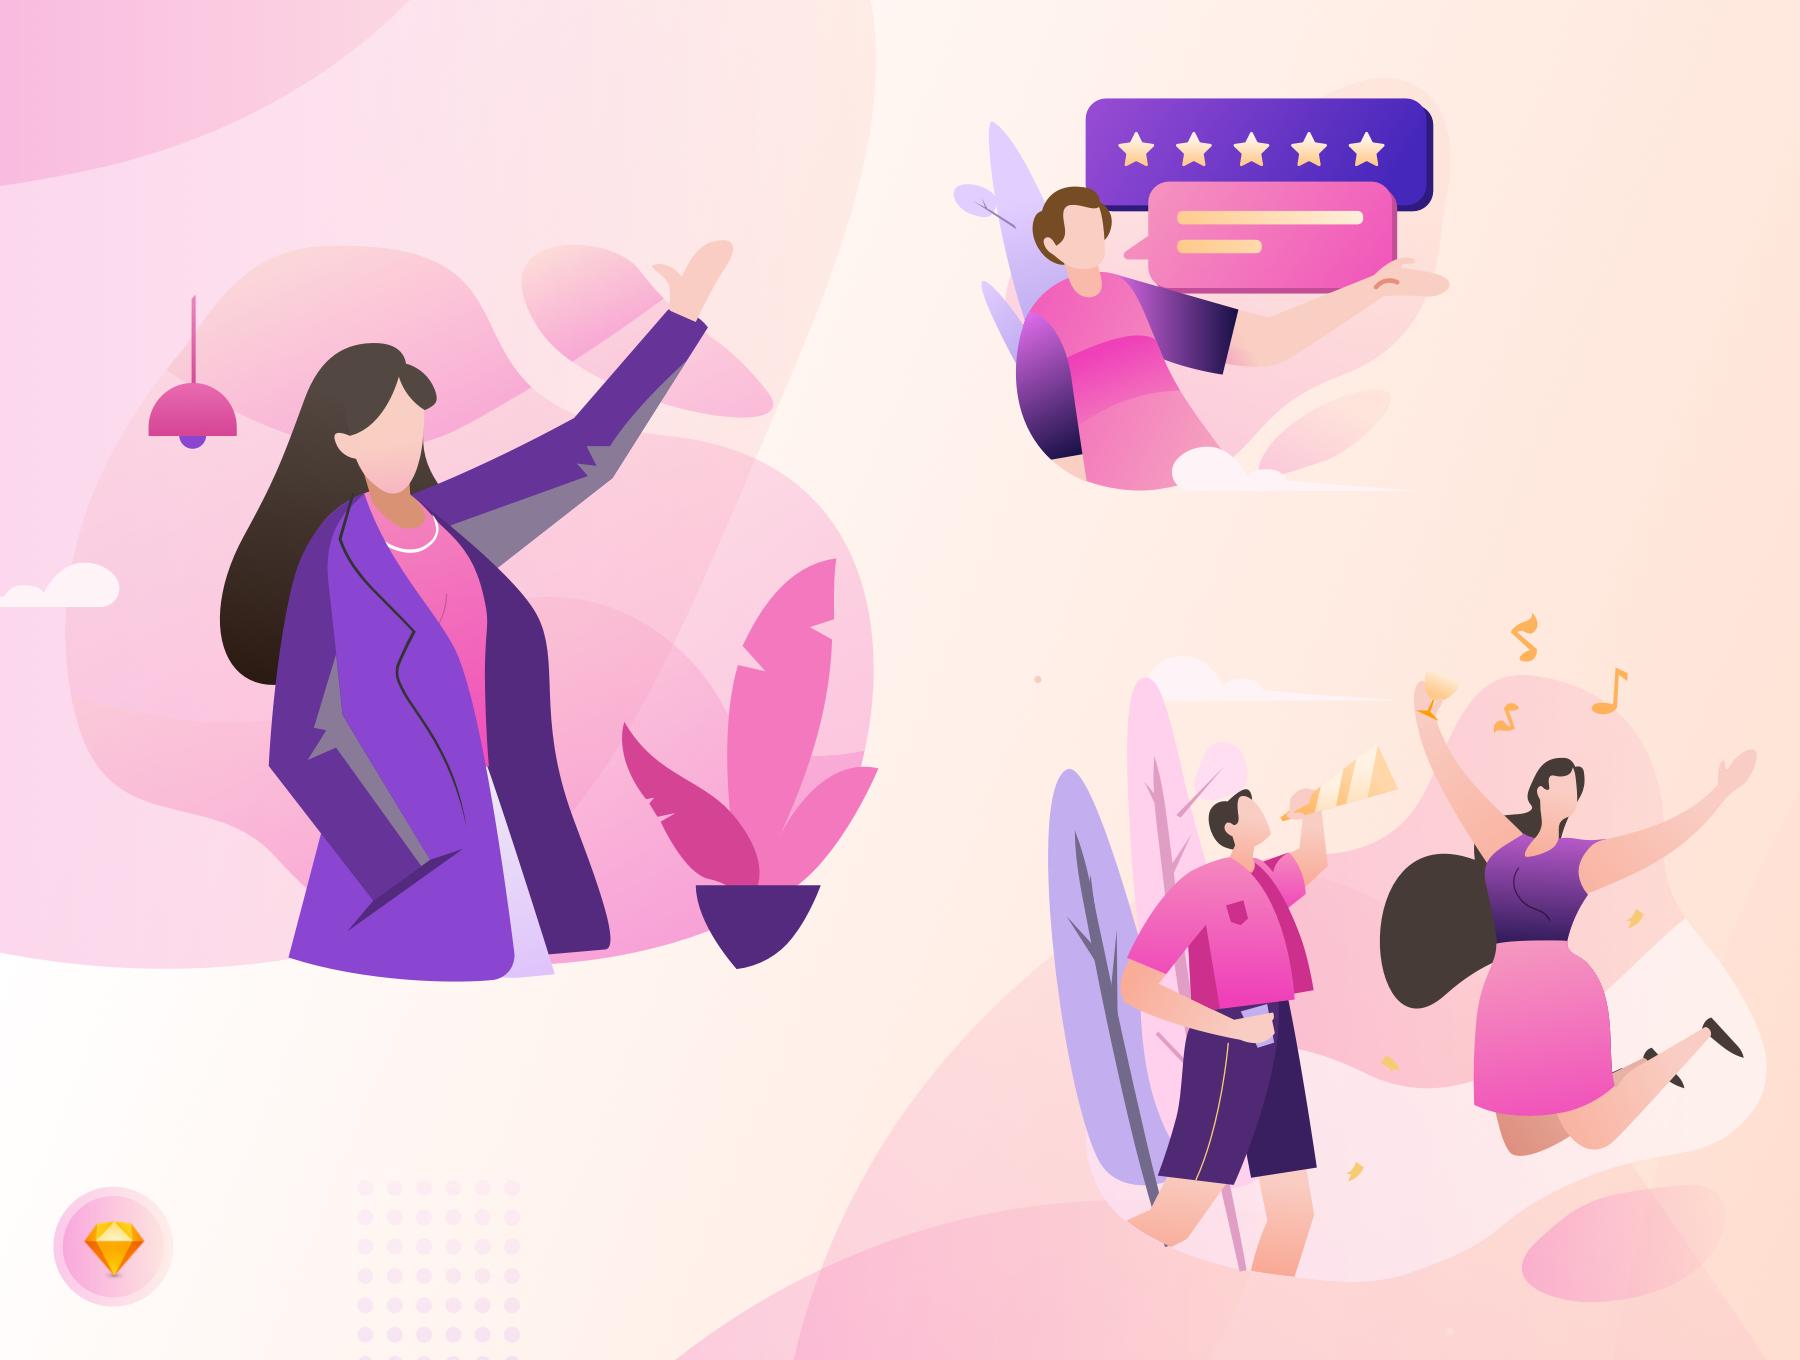 现代精美视频平台APP设计矢量插画素材包 Laras Video Illustration Pack插图(1)